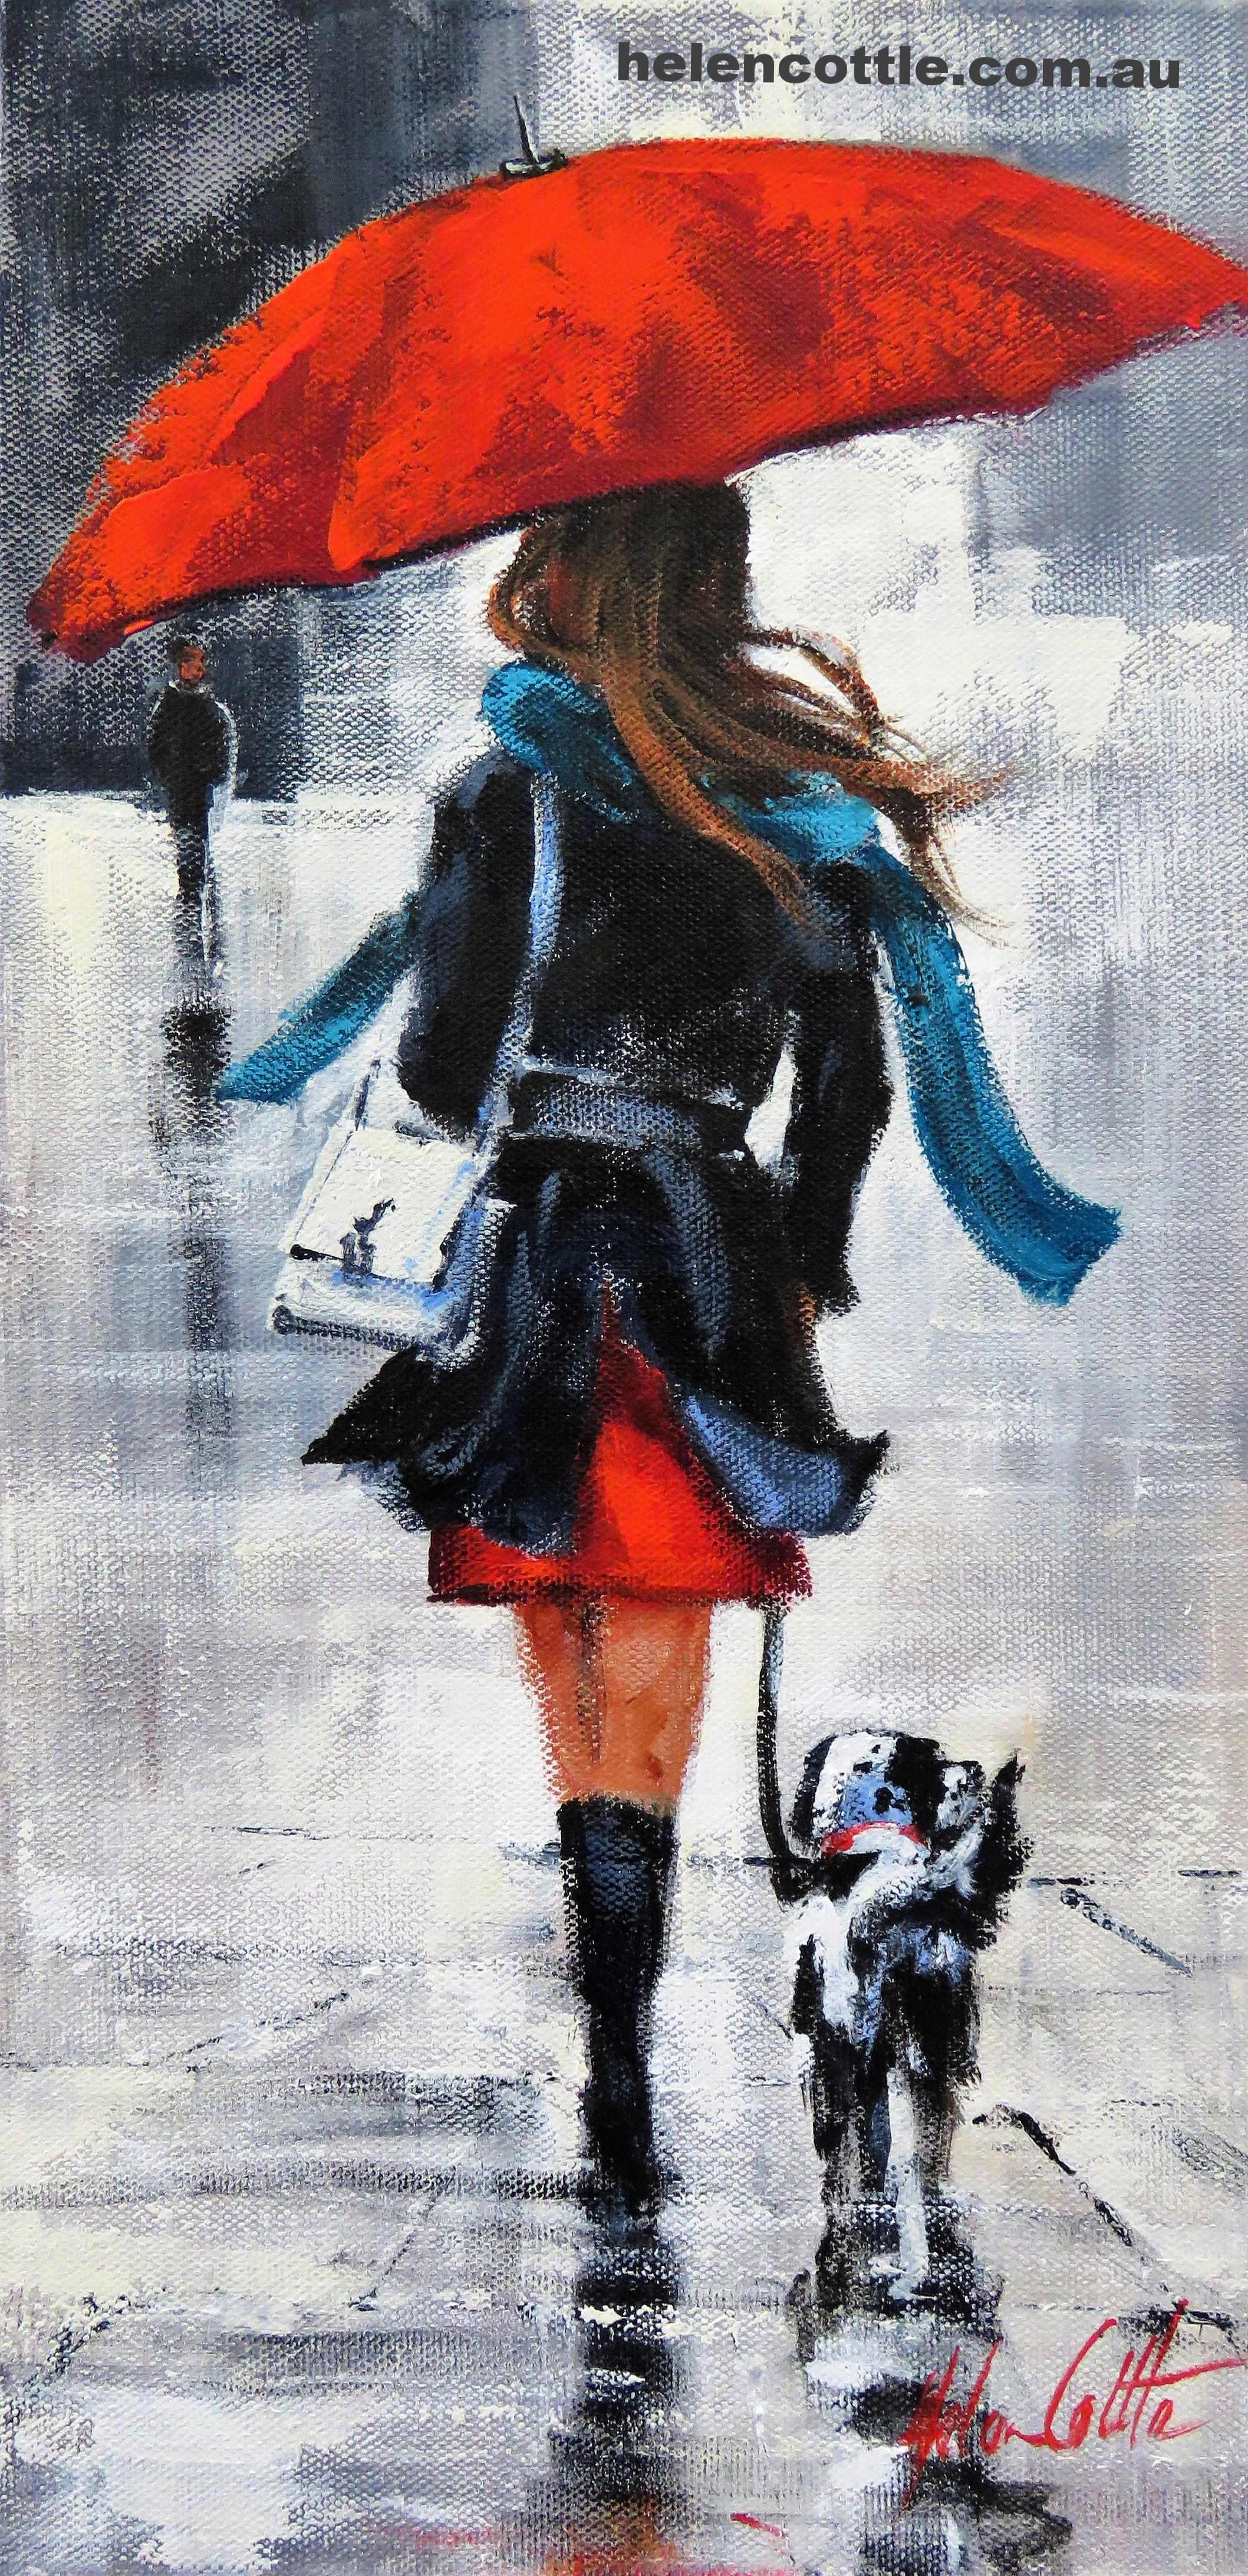 Wednesday Walk Acrylic on canvas 40x20cm By Helen Cottle.JPG